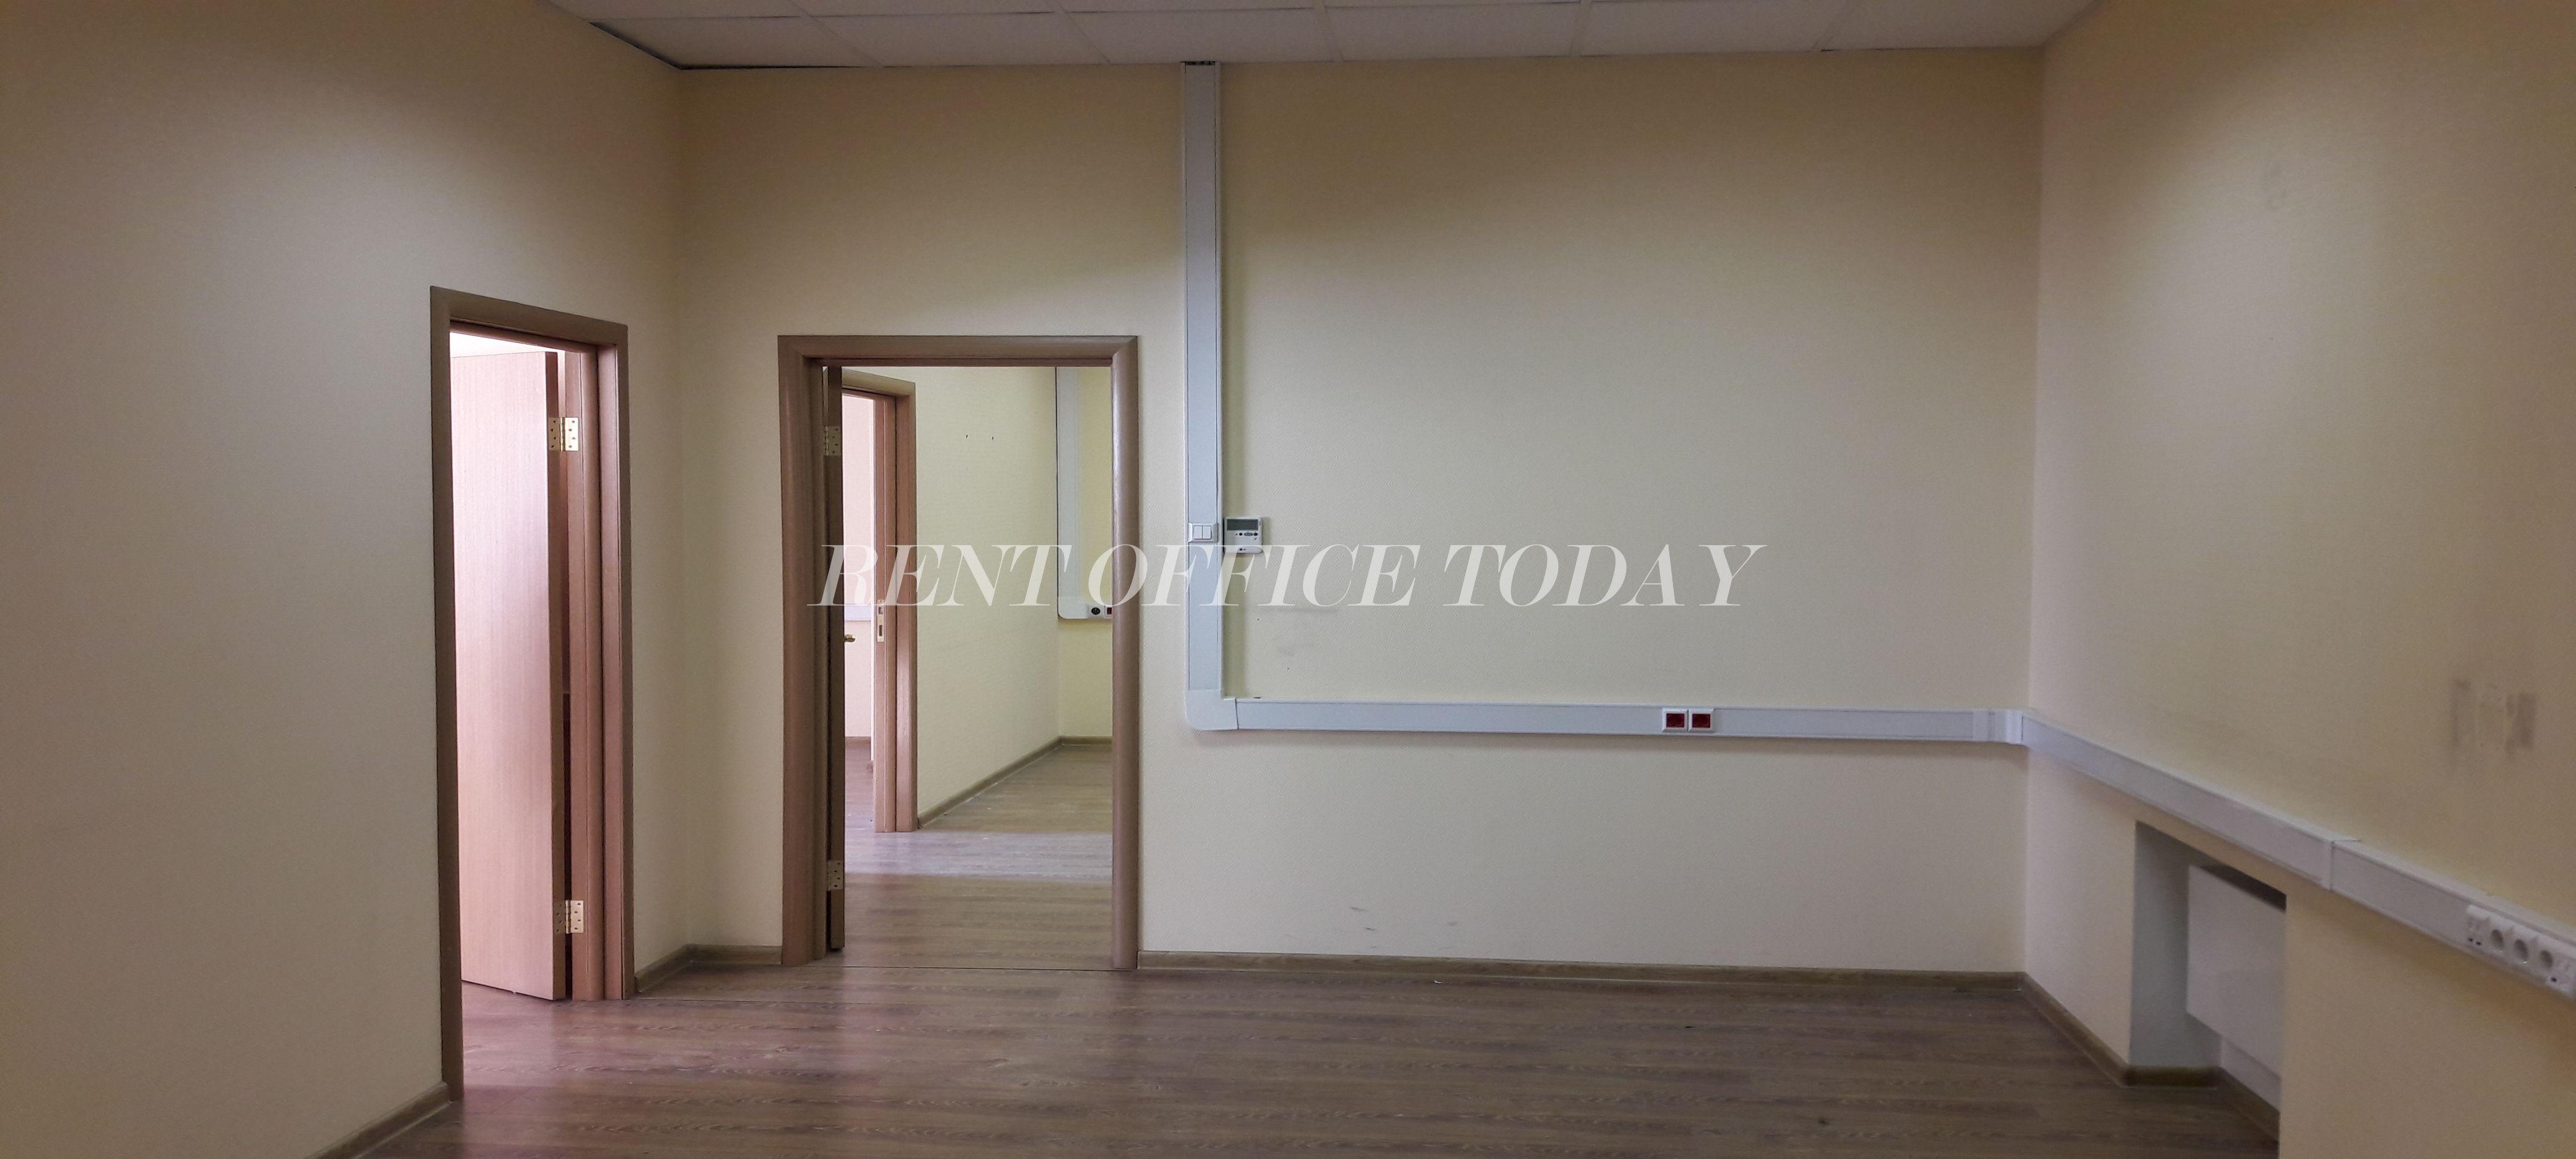 Бизнес центр Лениградский 80